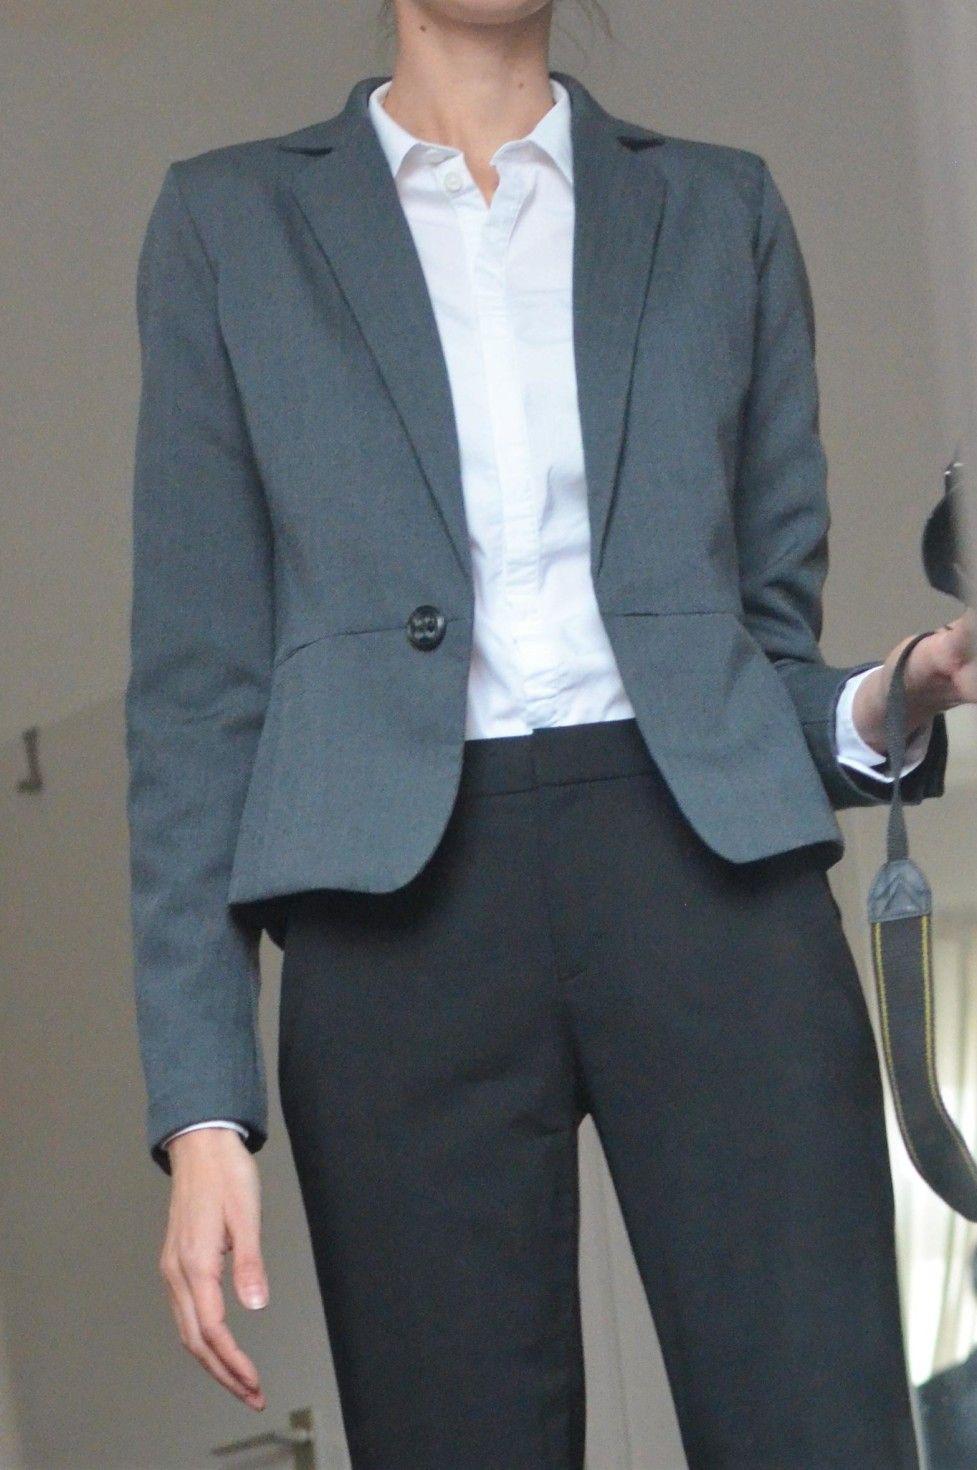 Mein burda style | Mode zum Selbernähen. burda style – Das ...